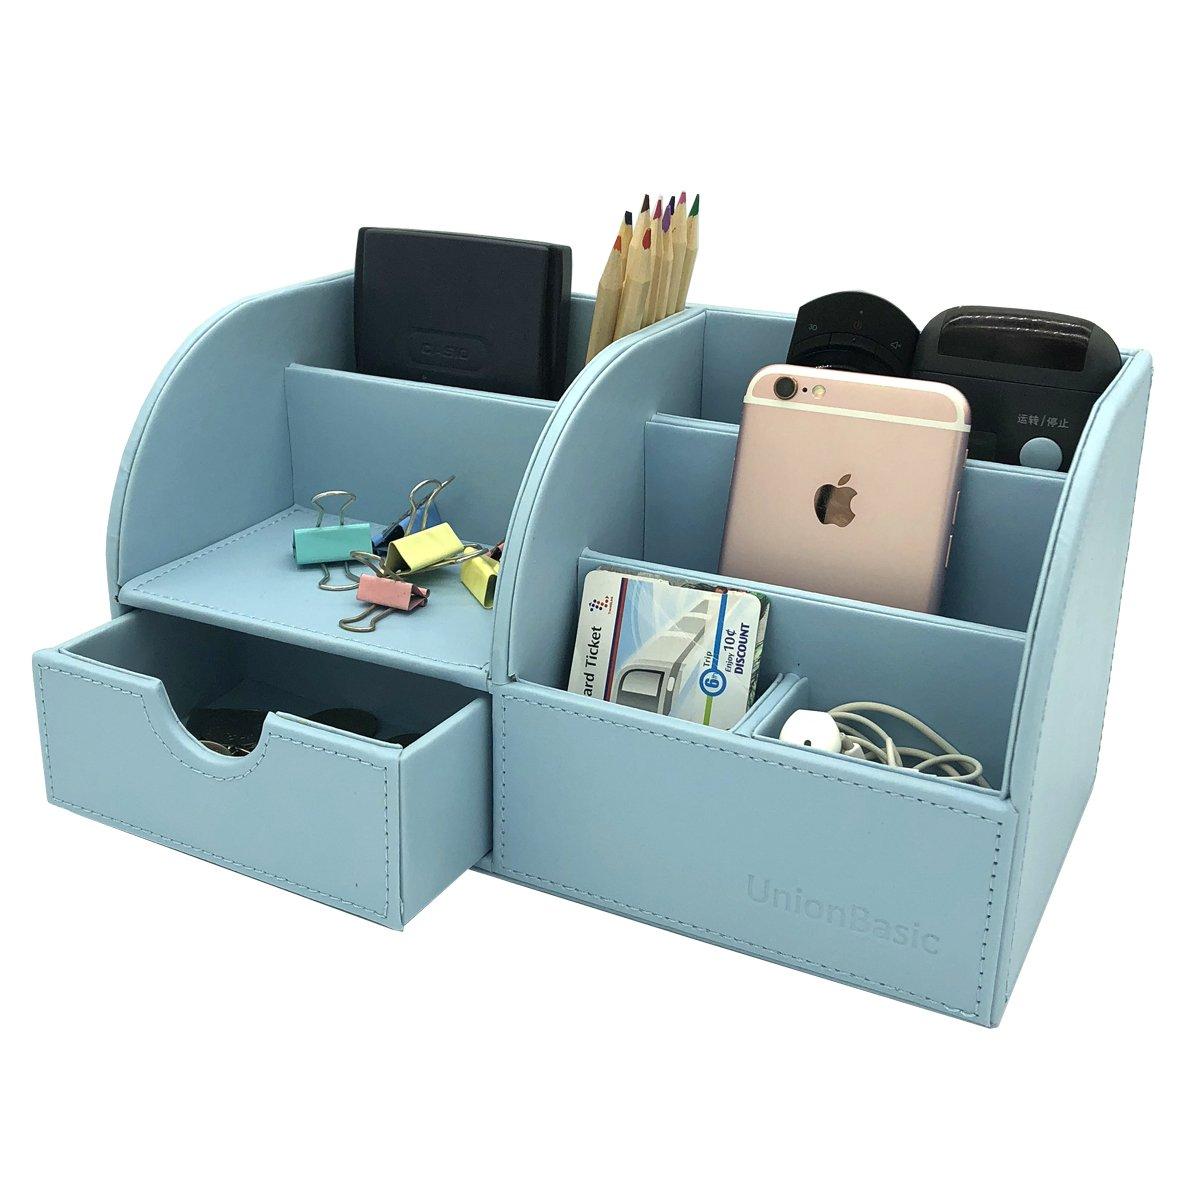 UnionBasic Office Desk Organizer - Multifunctional PU Leather Desktop Storage Box - Business Card/Pen/Pencil/Mobile Phone/Stationery Holder (Blue)